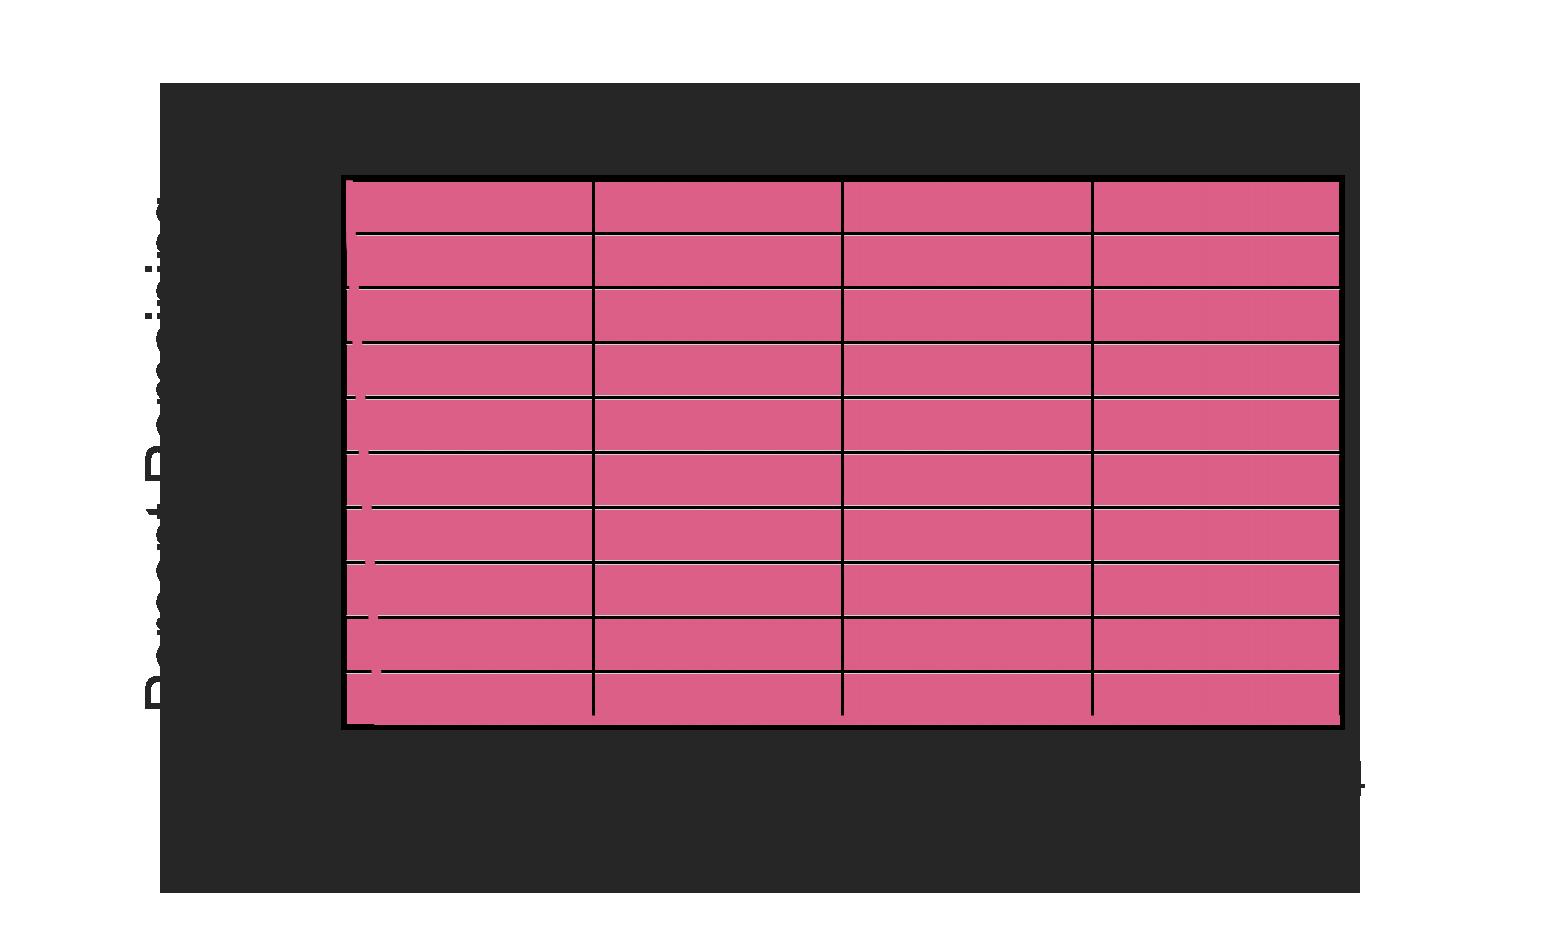 HALO LED MS2 test graph